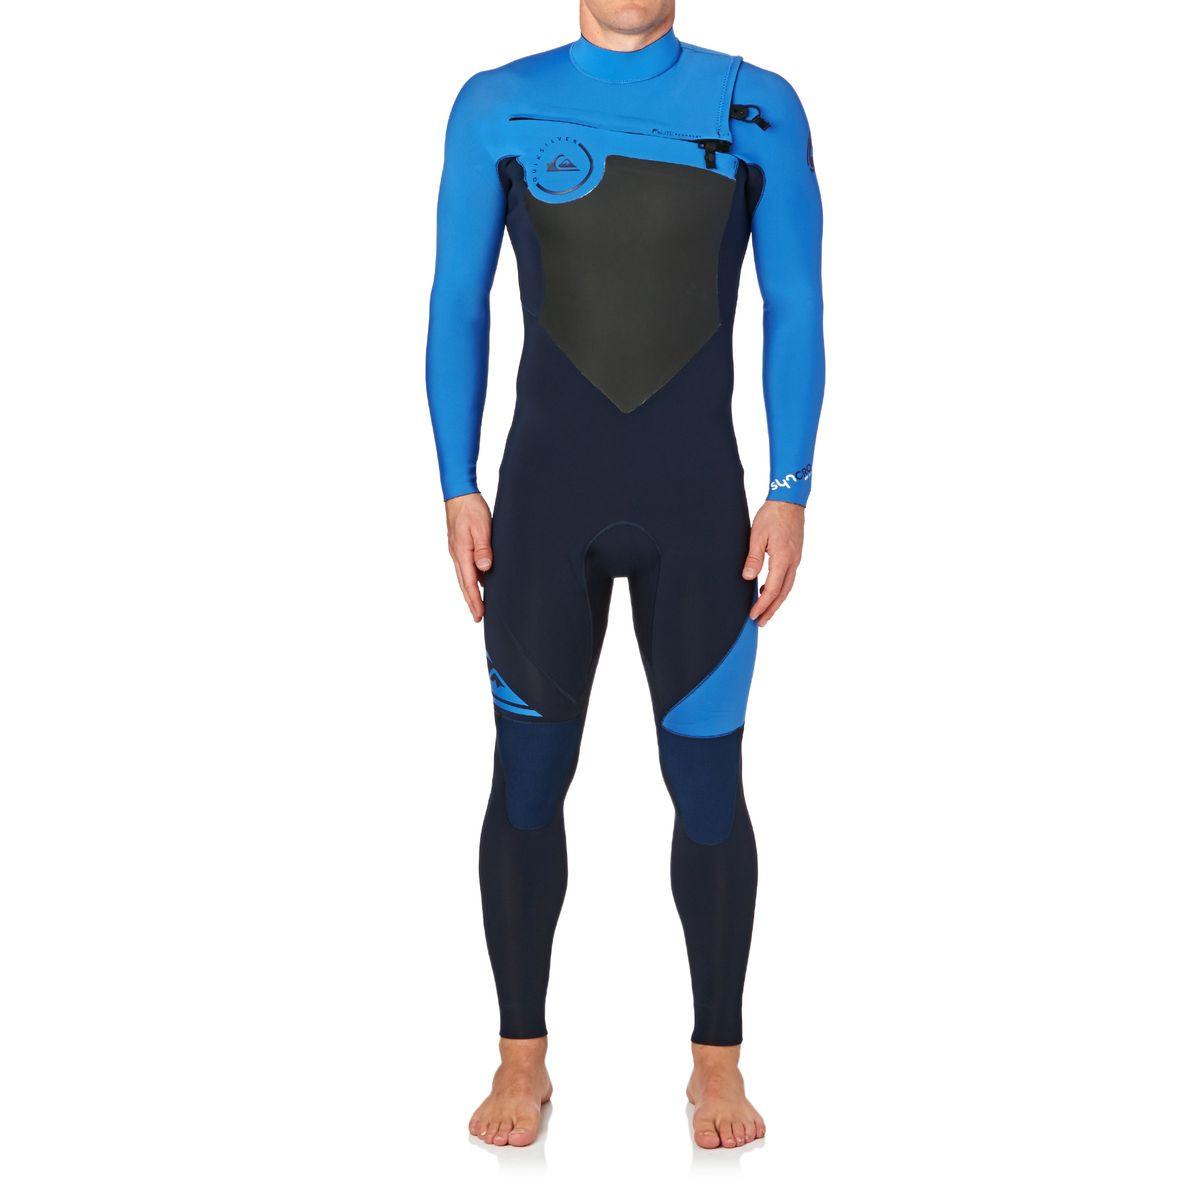 Quiksilver Syncro 3/2mm 2017 Chest Zip Wetsuit - Navy Blazer